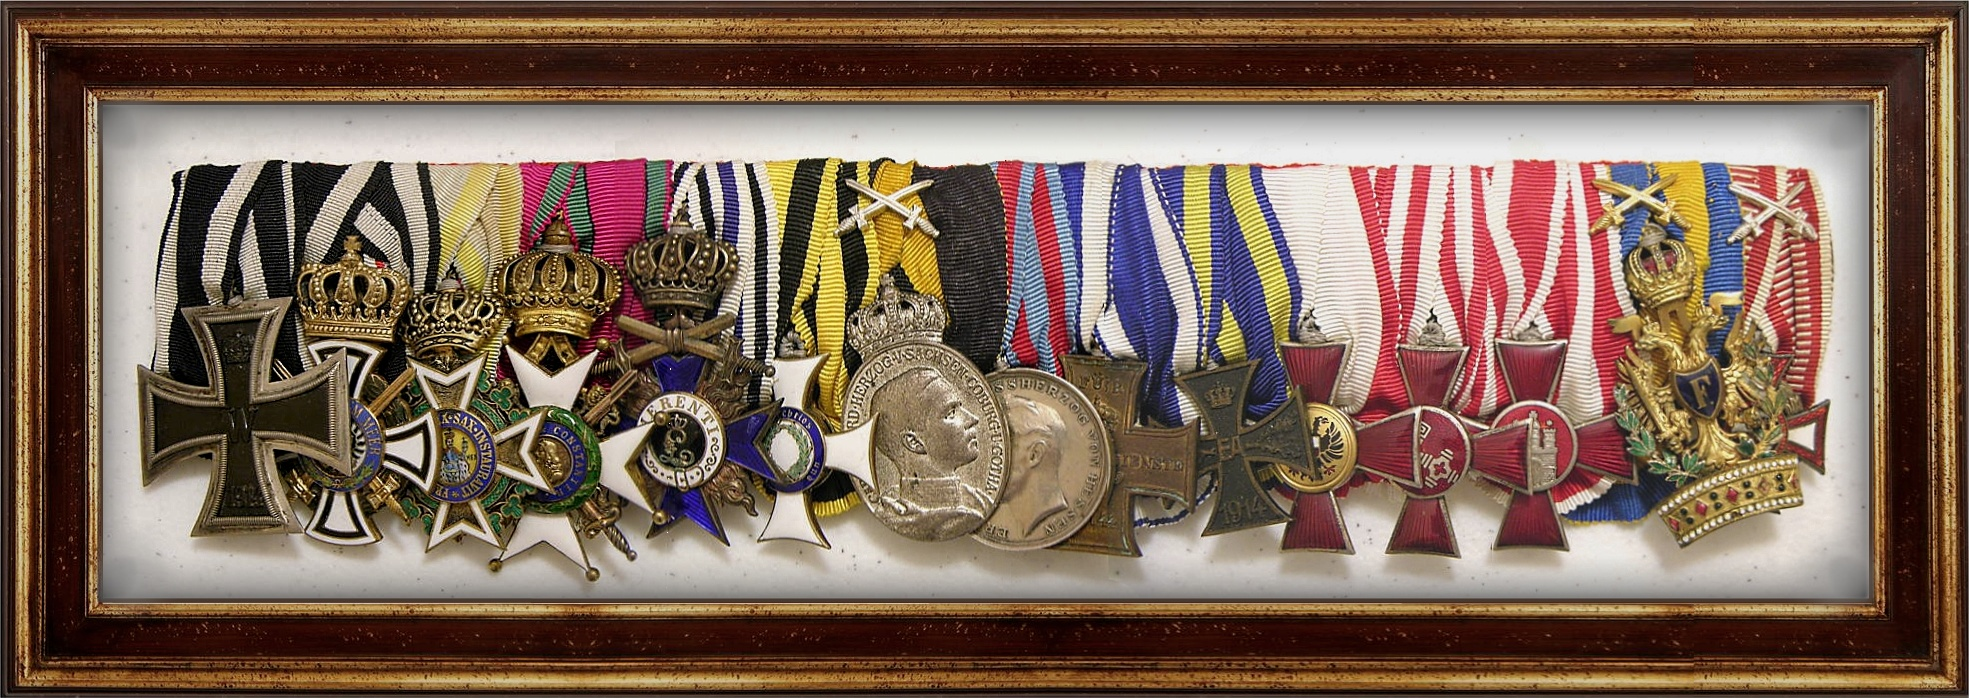 MvR_Medals.jpg